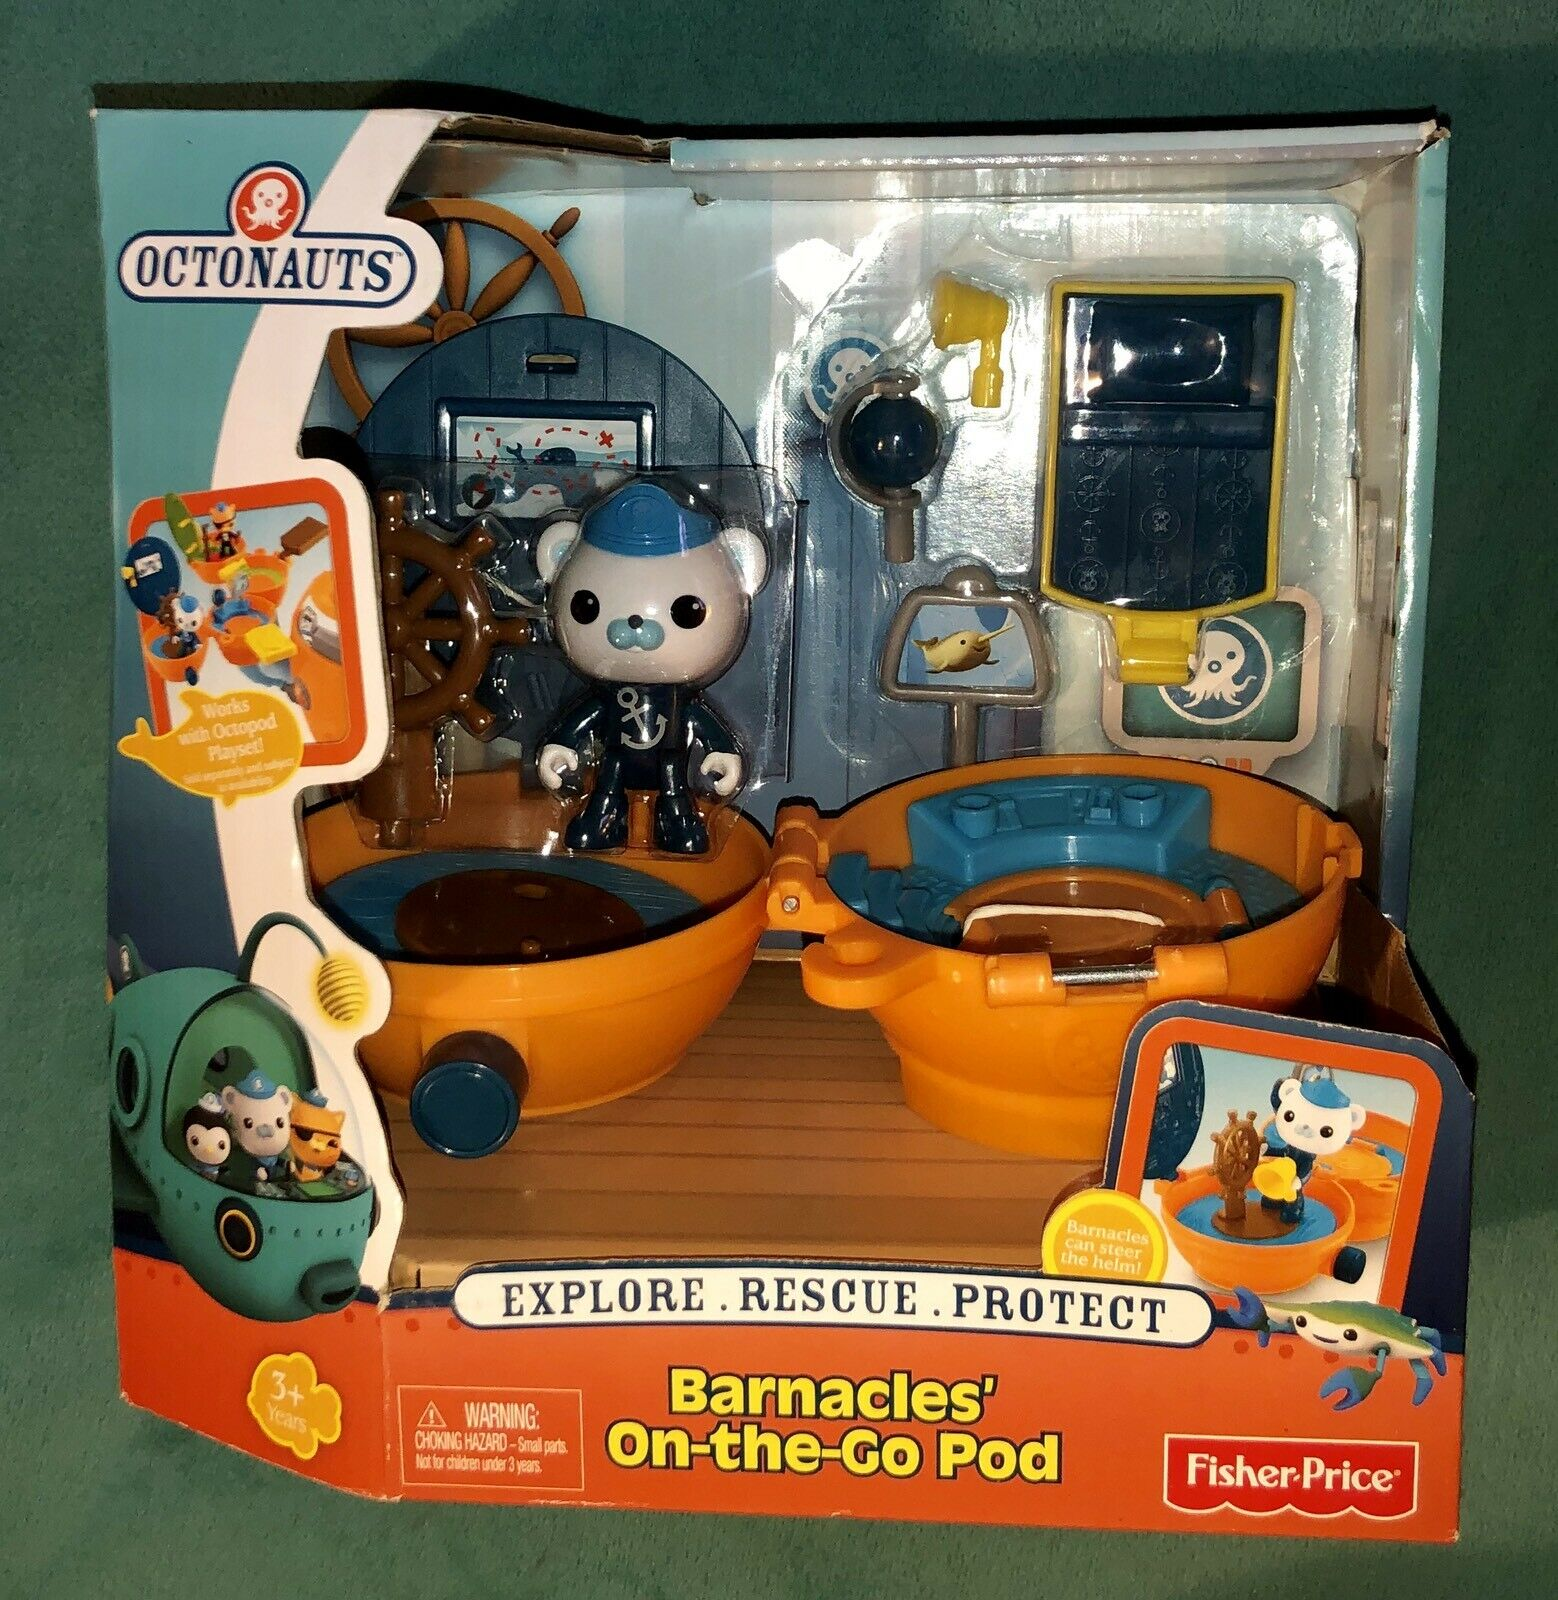 Fisher Fisher Fisher Price Octonauts Barnacles On The Go Pod giocattolo Set NIB RARE 2013 Mattel 798251